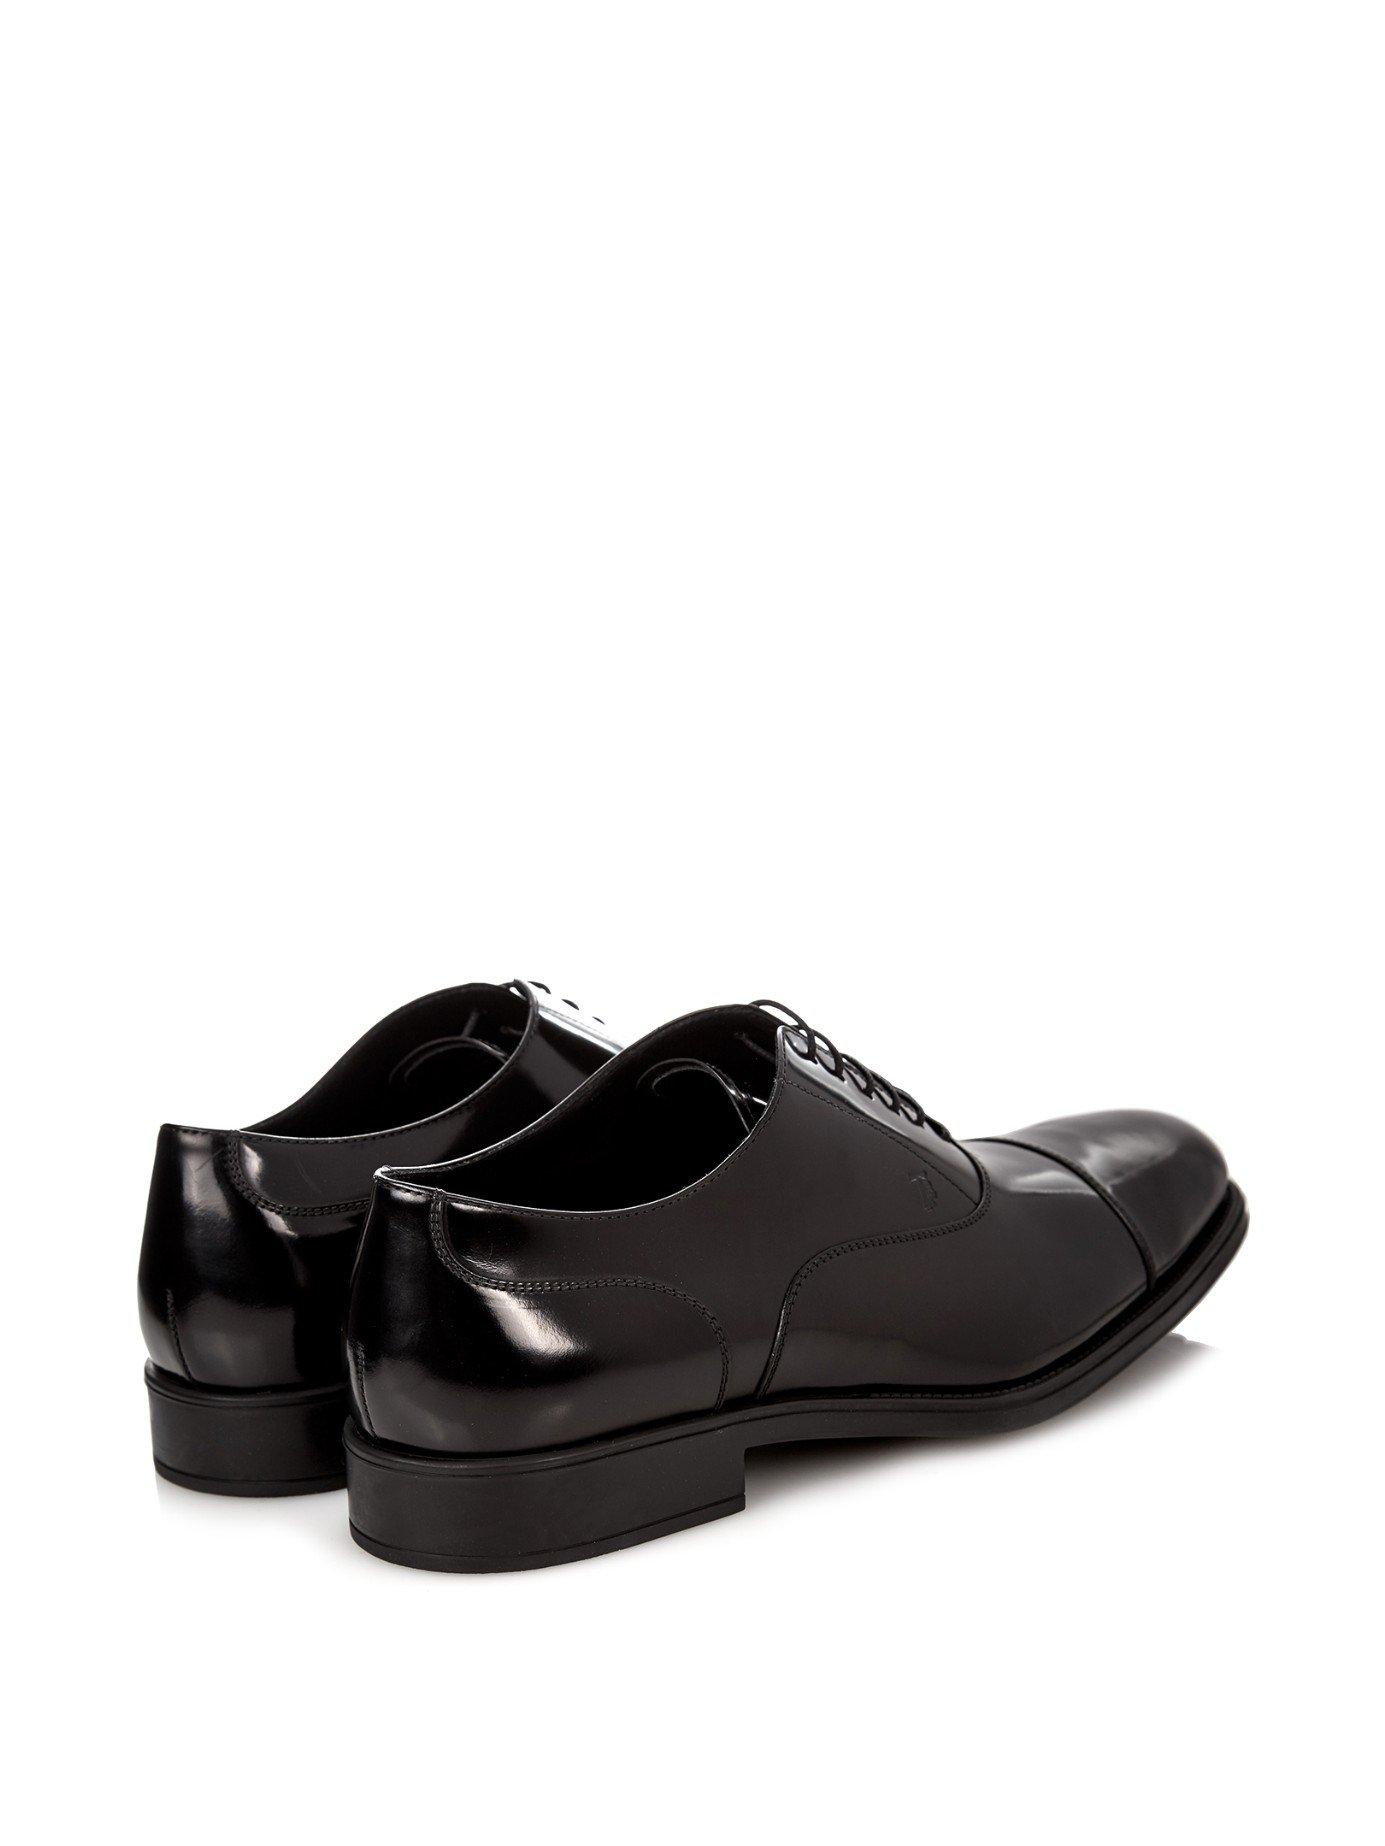 Tod's lace up derby shoes store sale online EKuC5ZYXl